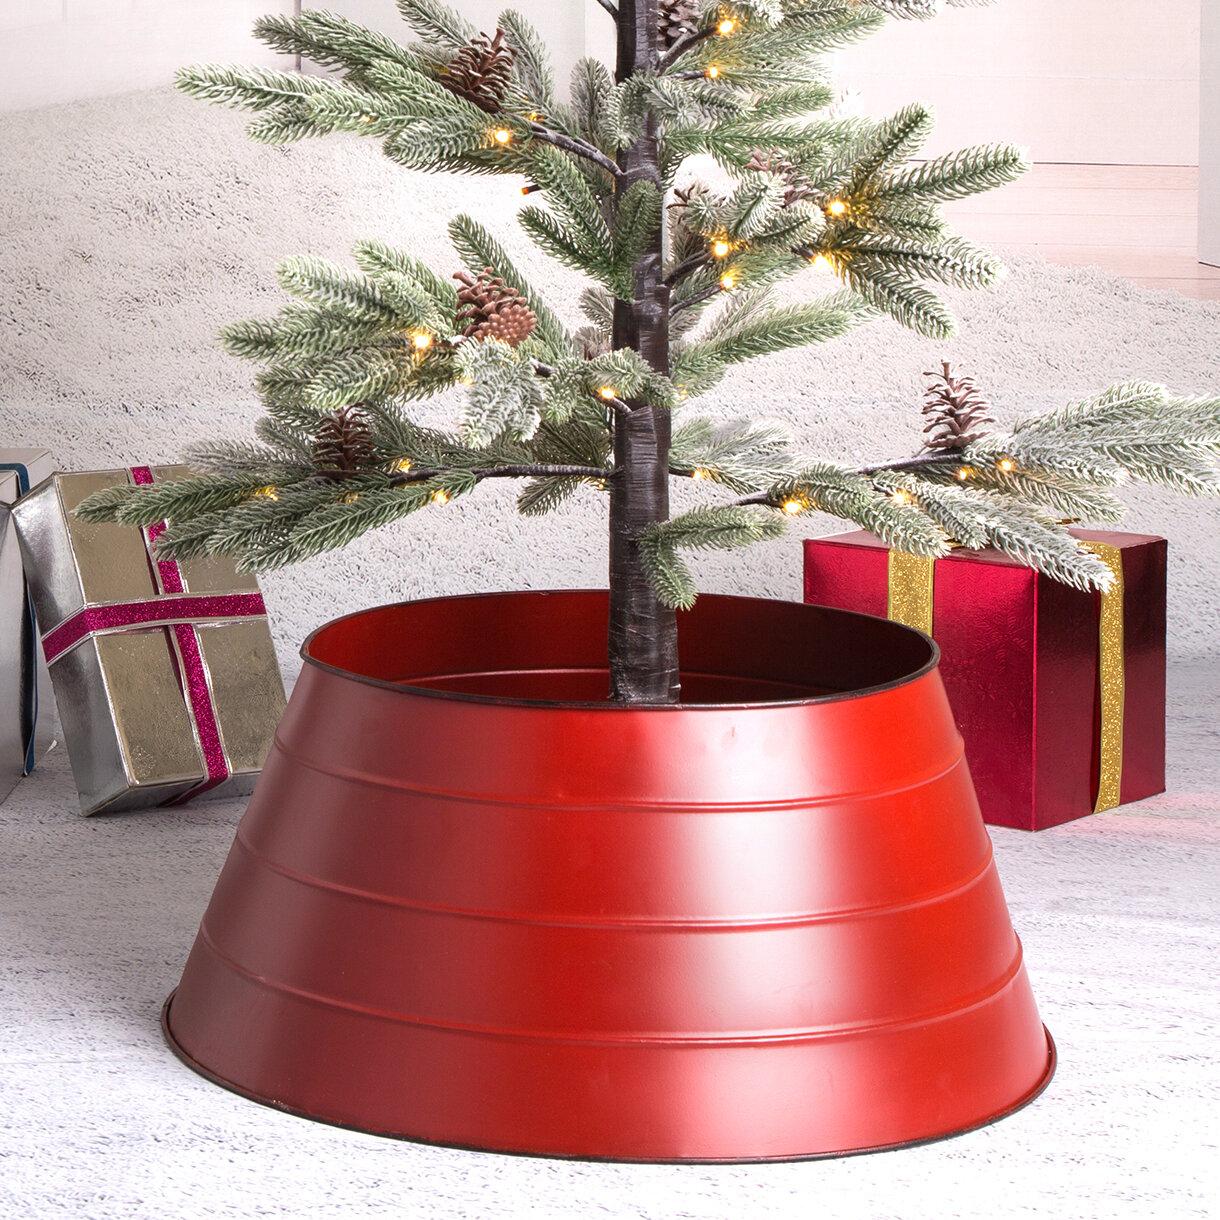 Metal Tree Collar Christmas Tree Skirts Collars You Ll Love In 2021 Wayfair